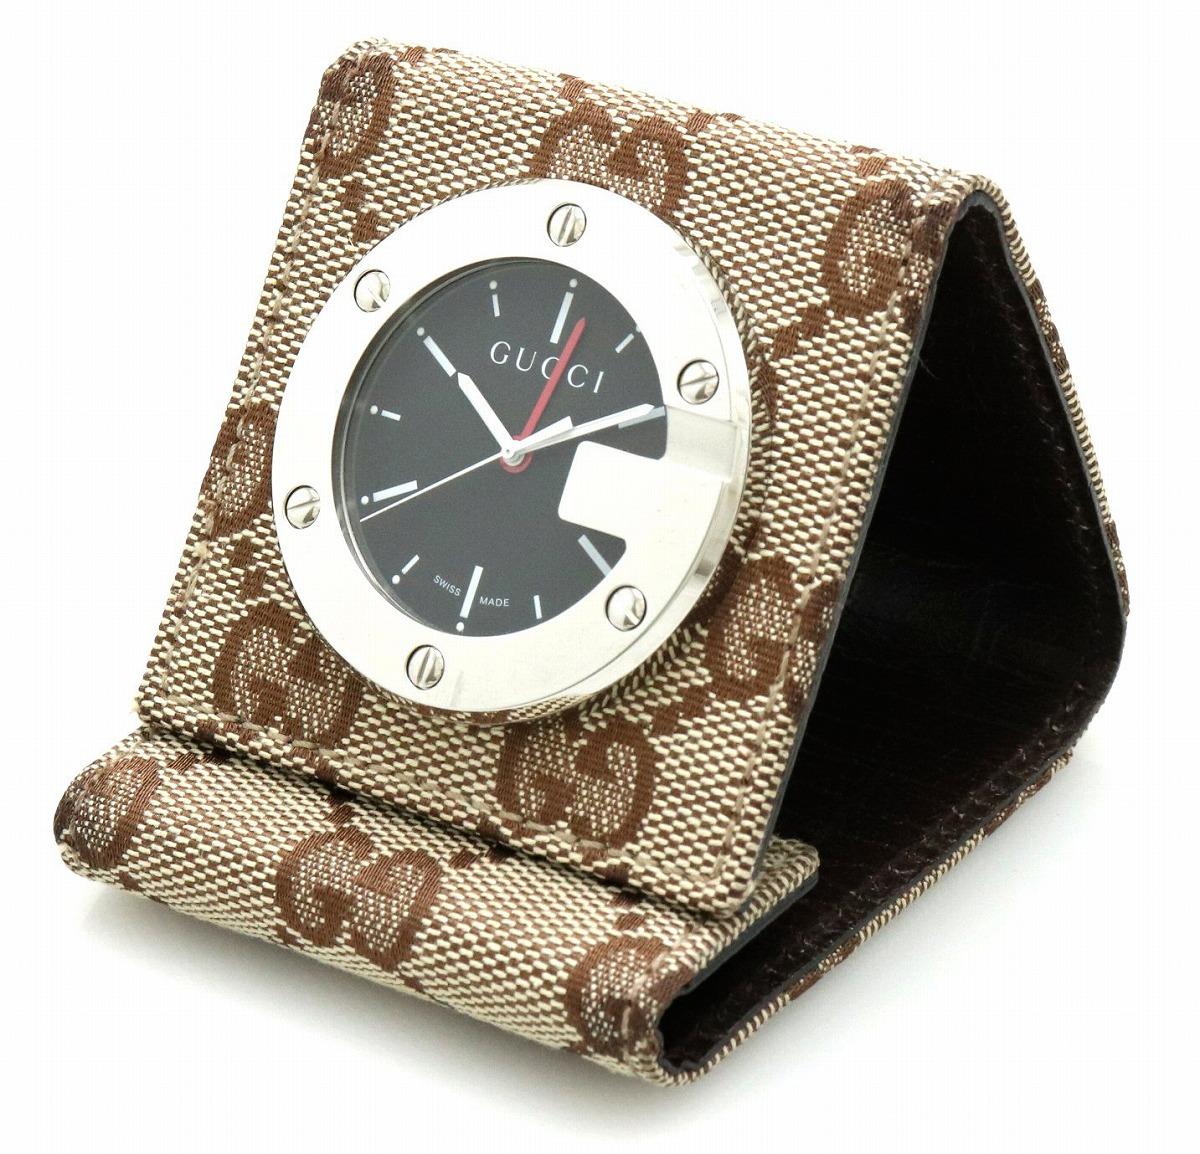 GUCCI グッチ ブラック文字盤 GGキャンバス SS トラベルクロック アラーム 置時計 QZ クォーツ 200 YC200001 【中古】【k】